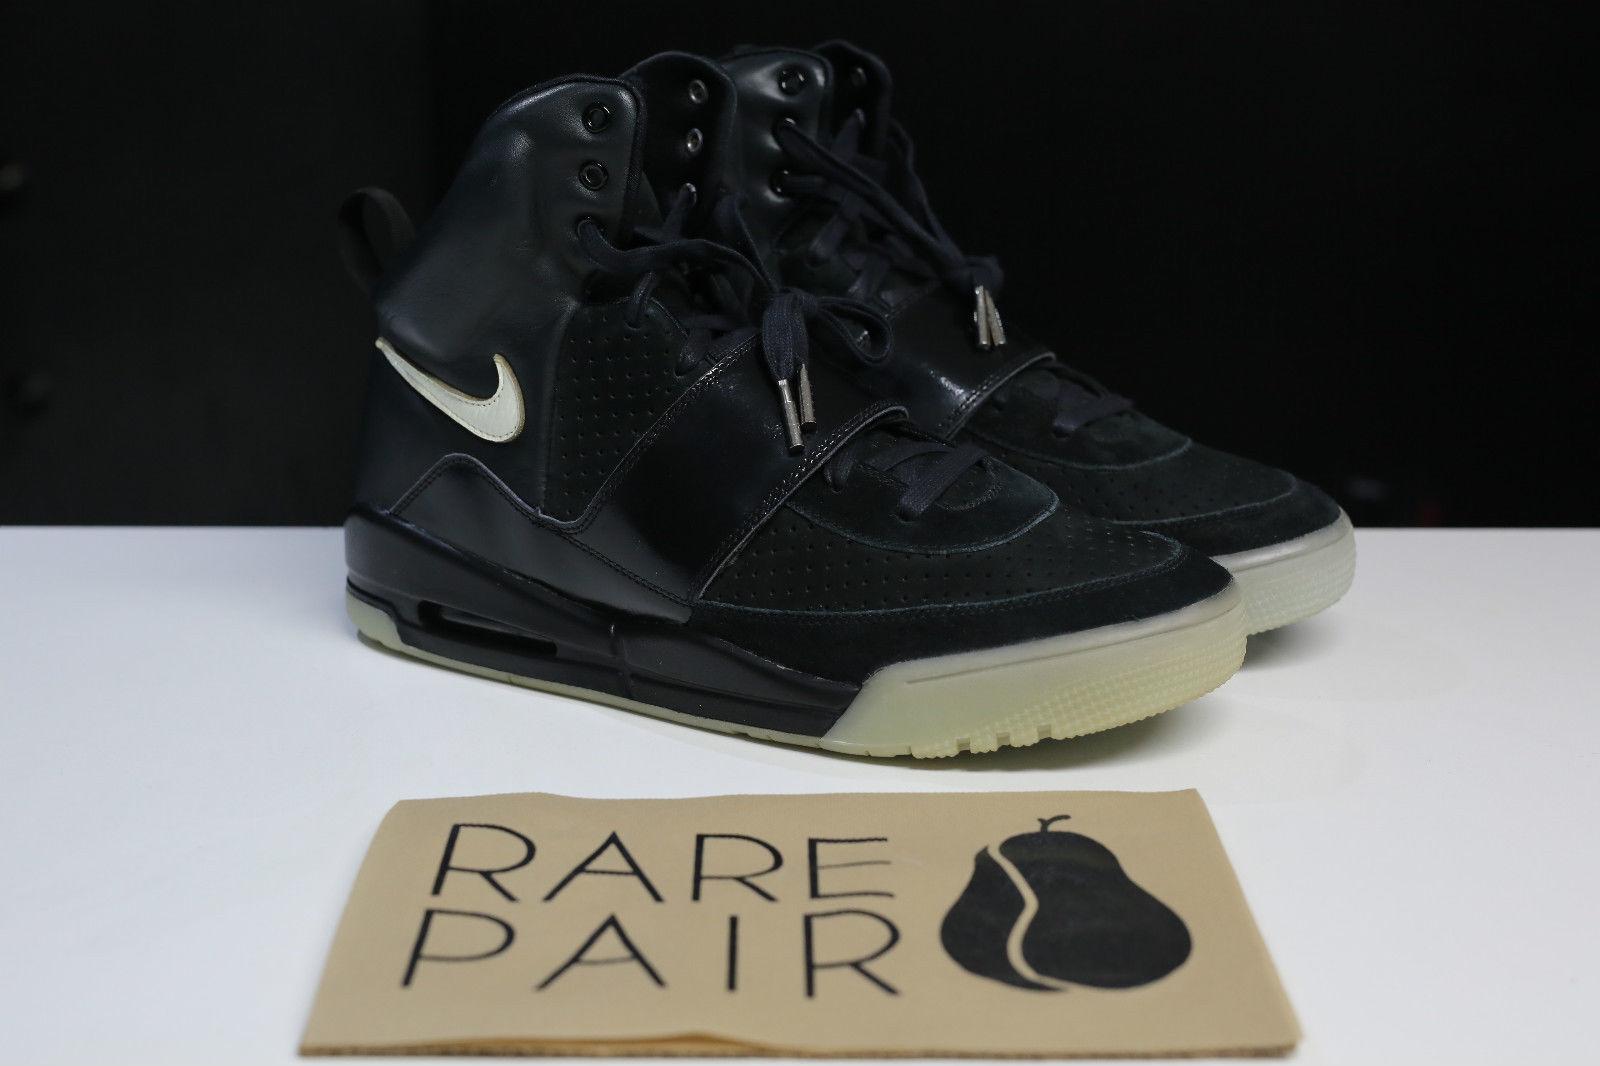 Nike Air Yeezy Kanye West Black/White Sample Pair Right